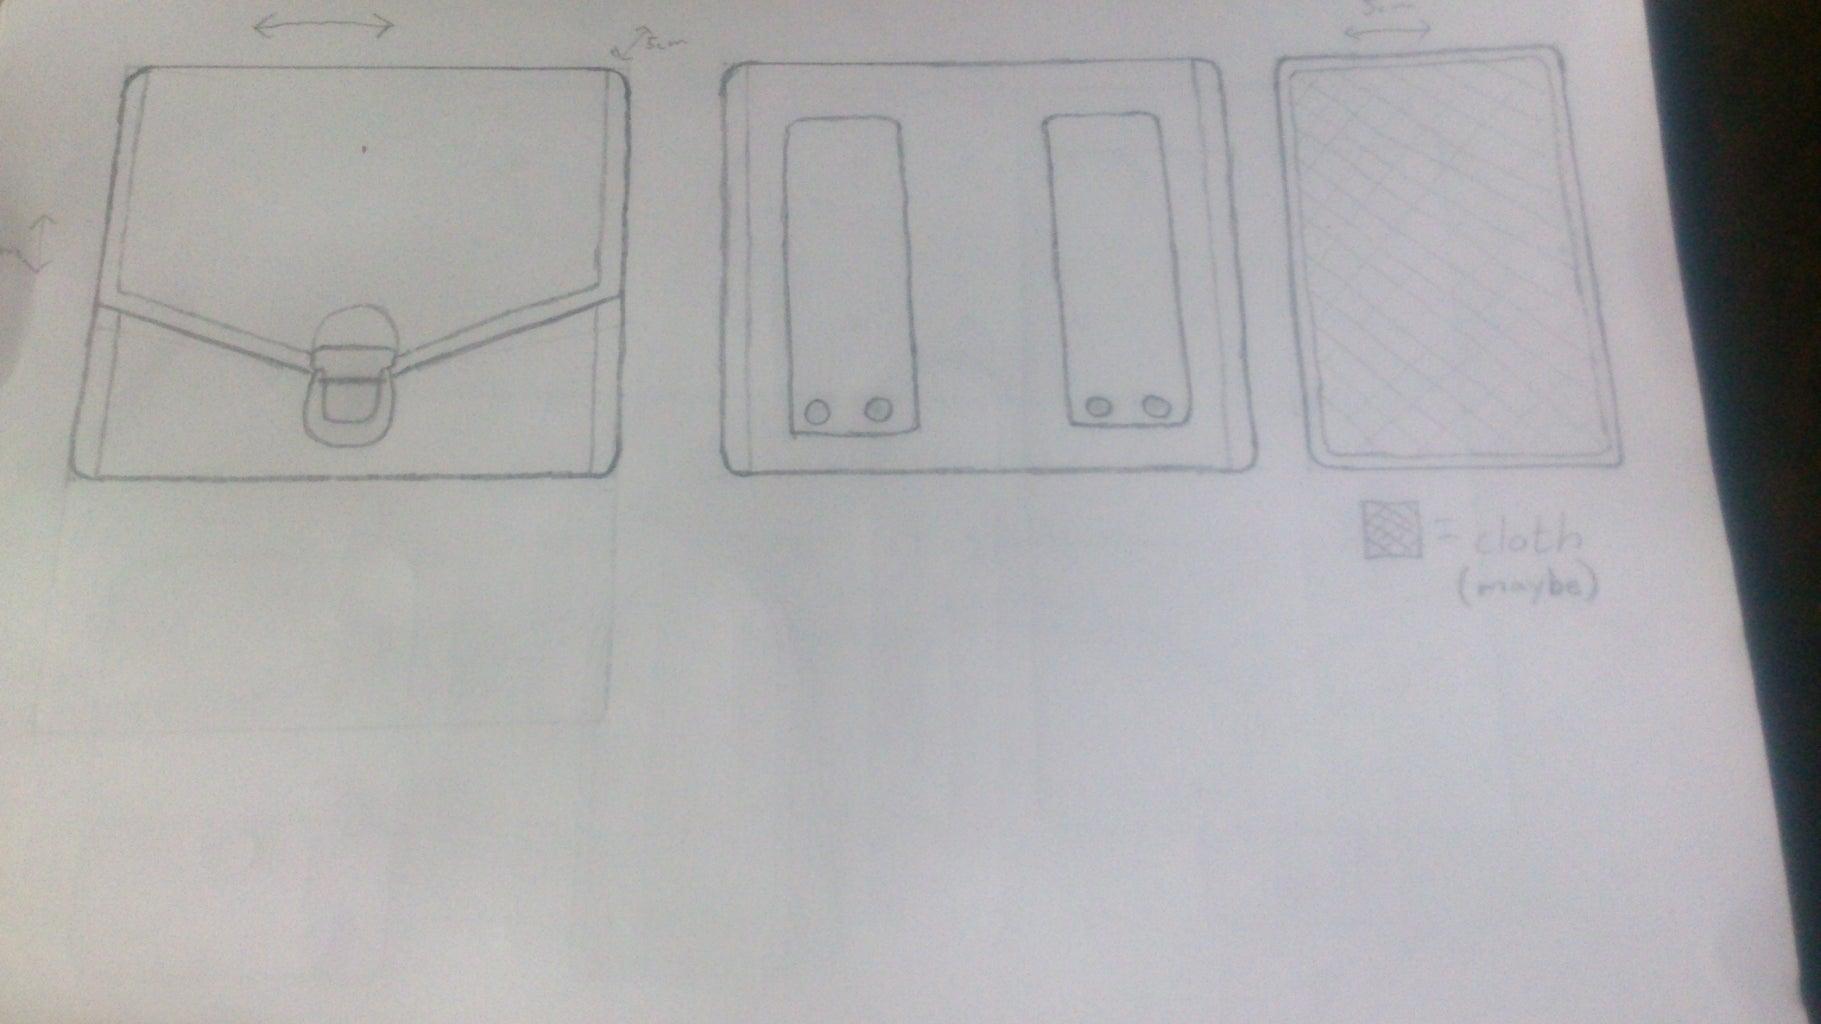 Sketching and Materials